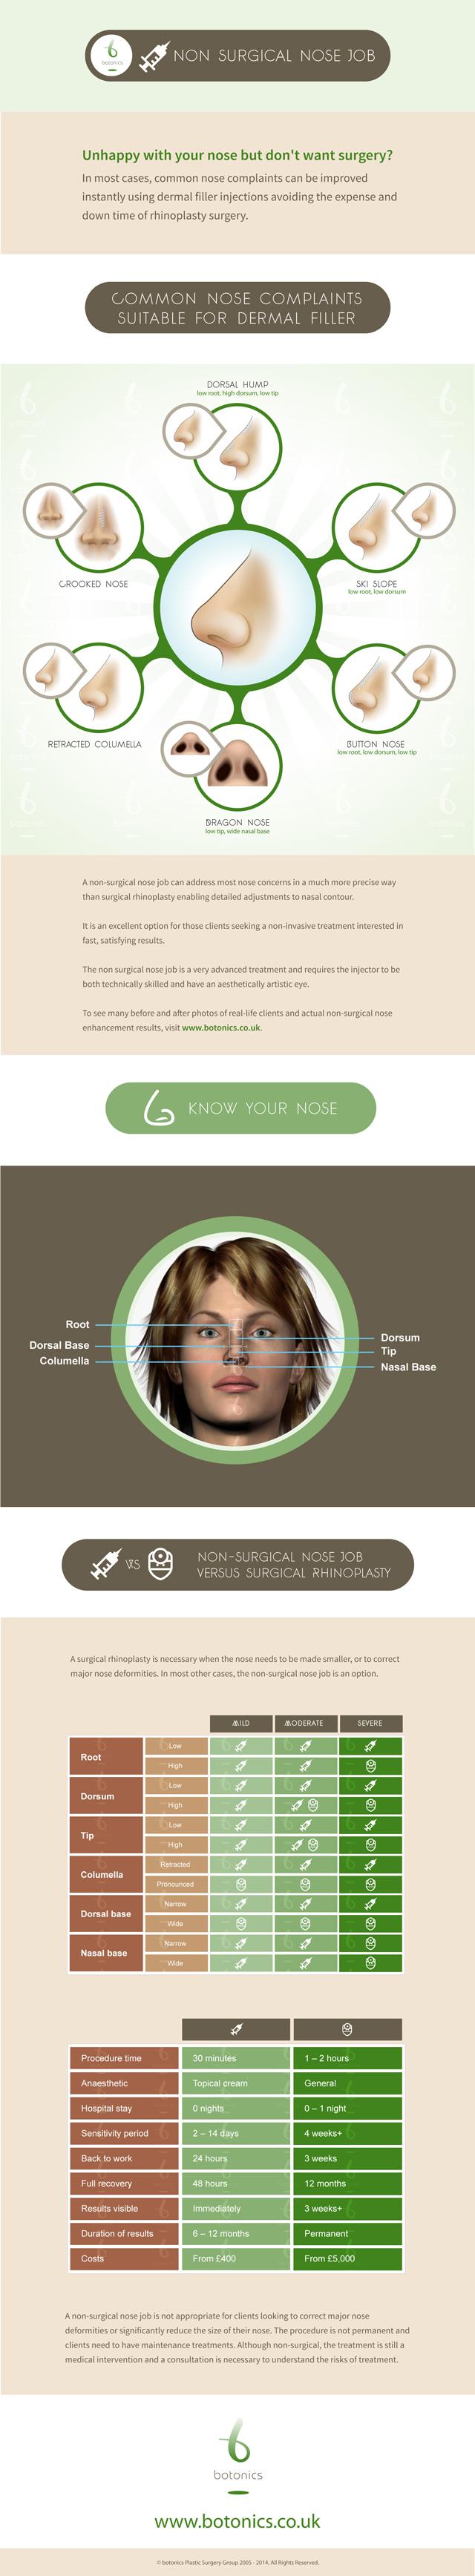 Non-surgical nose job infographic